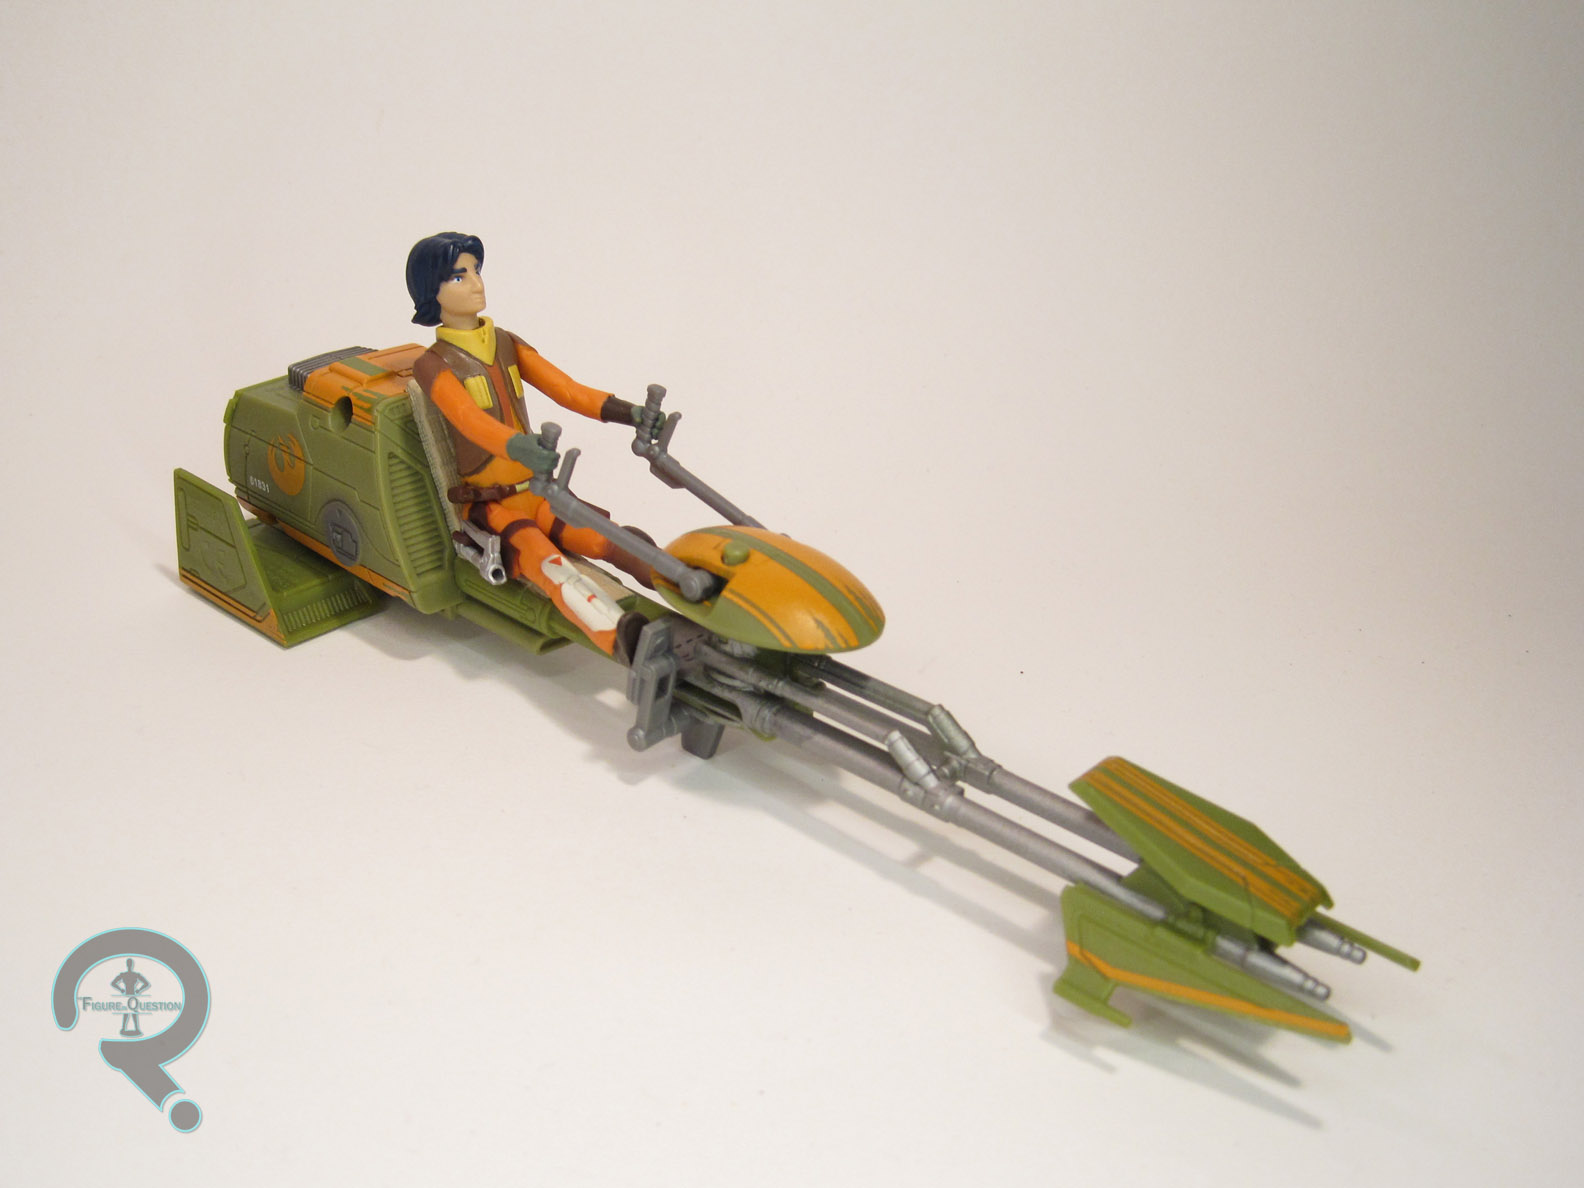 Disney Star Wars Rebels Ezra Bridger/'s SpeederHasbro Toy Hero New in Box Bike